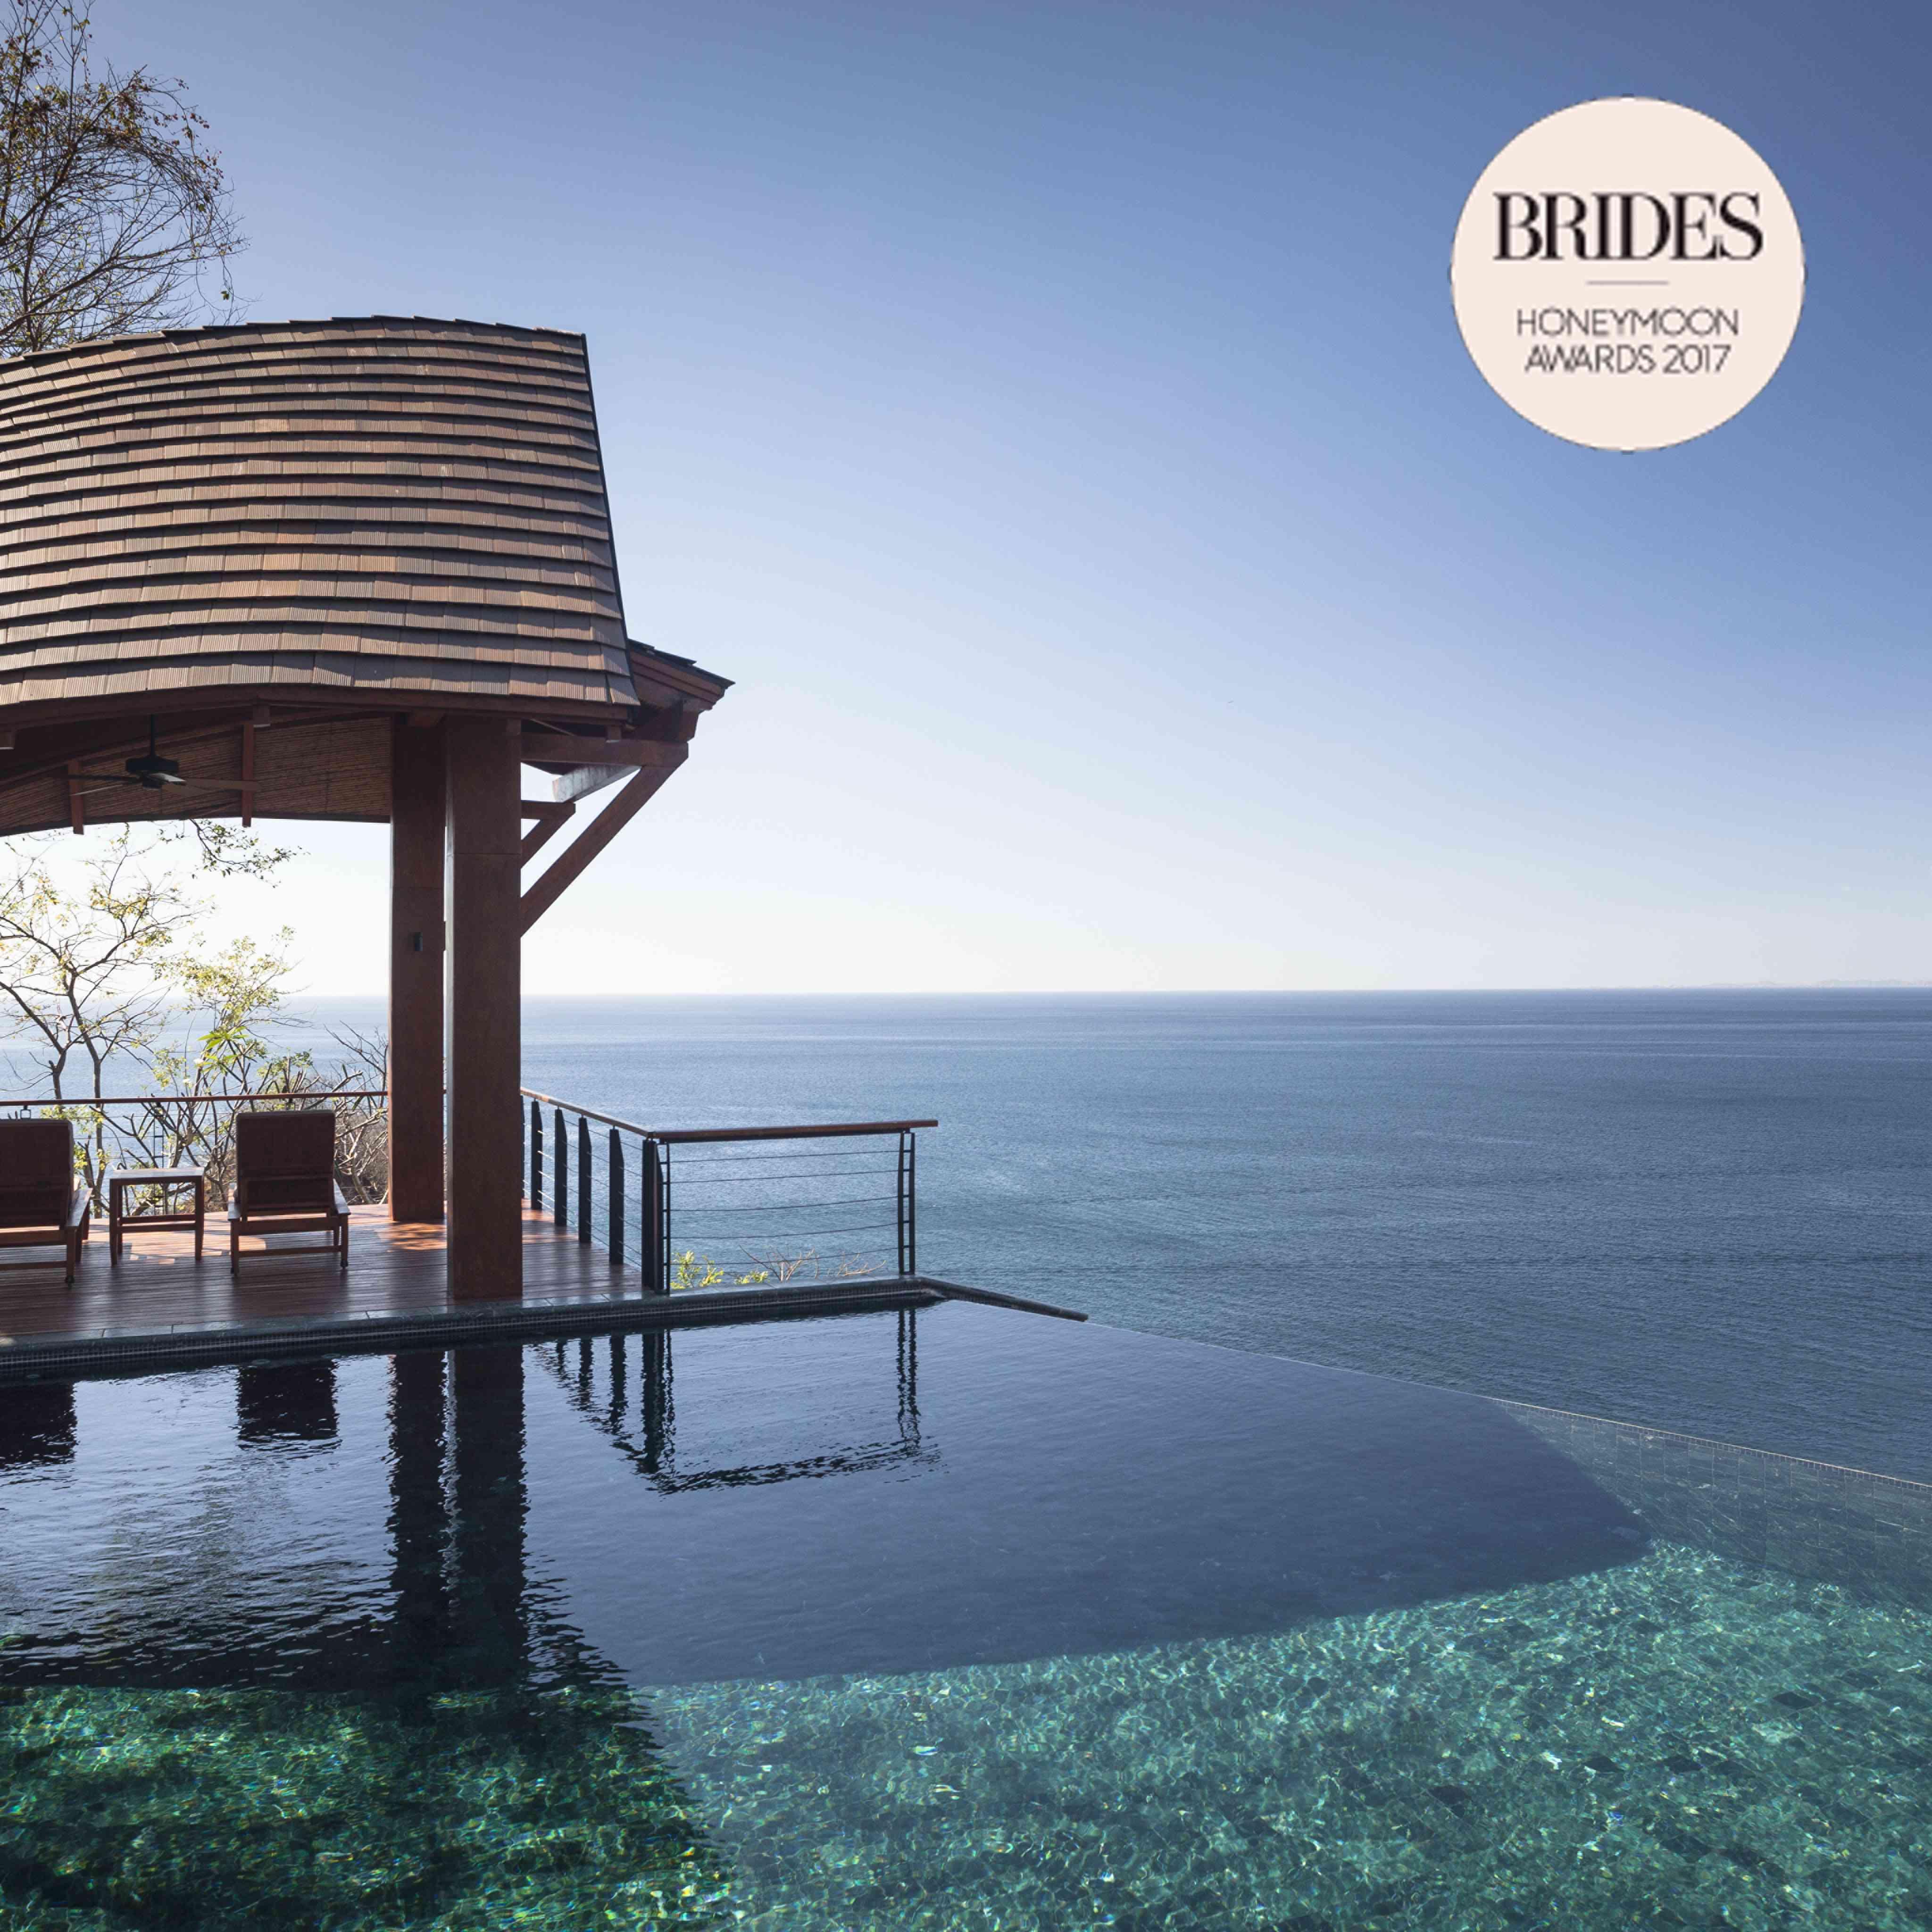 2017 Brides Honeymoon Awards: The Top 10 Resorts In